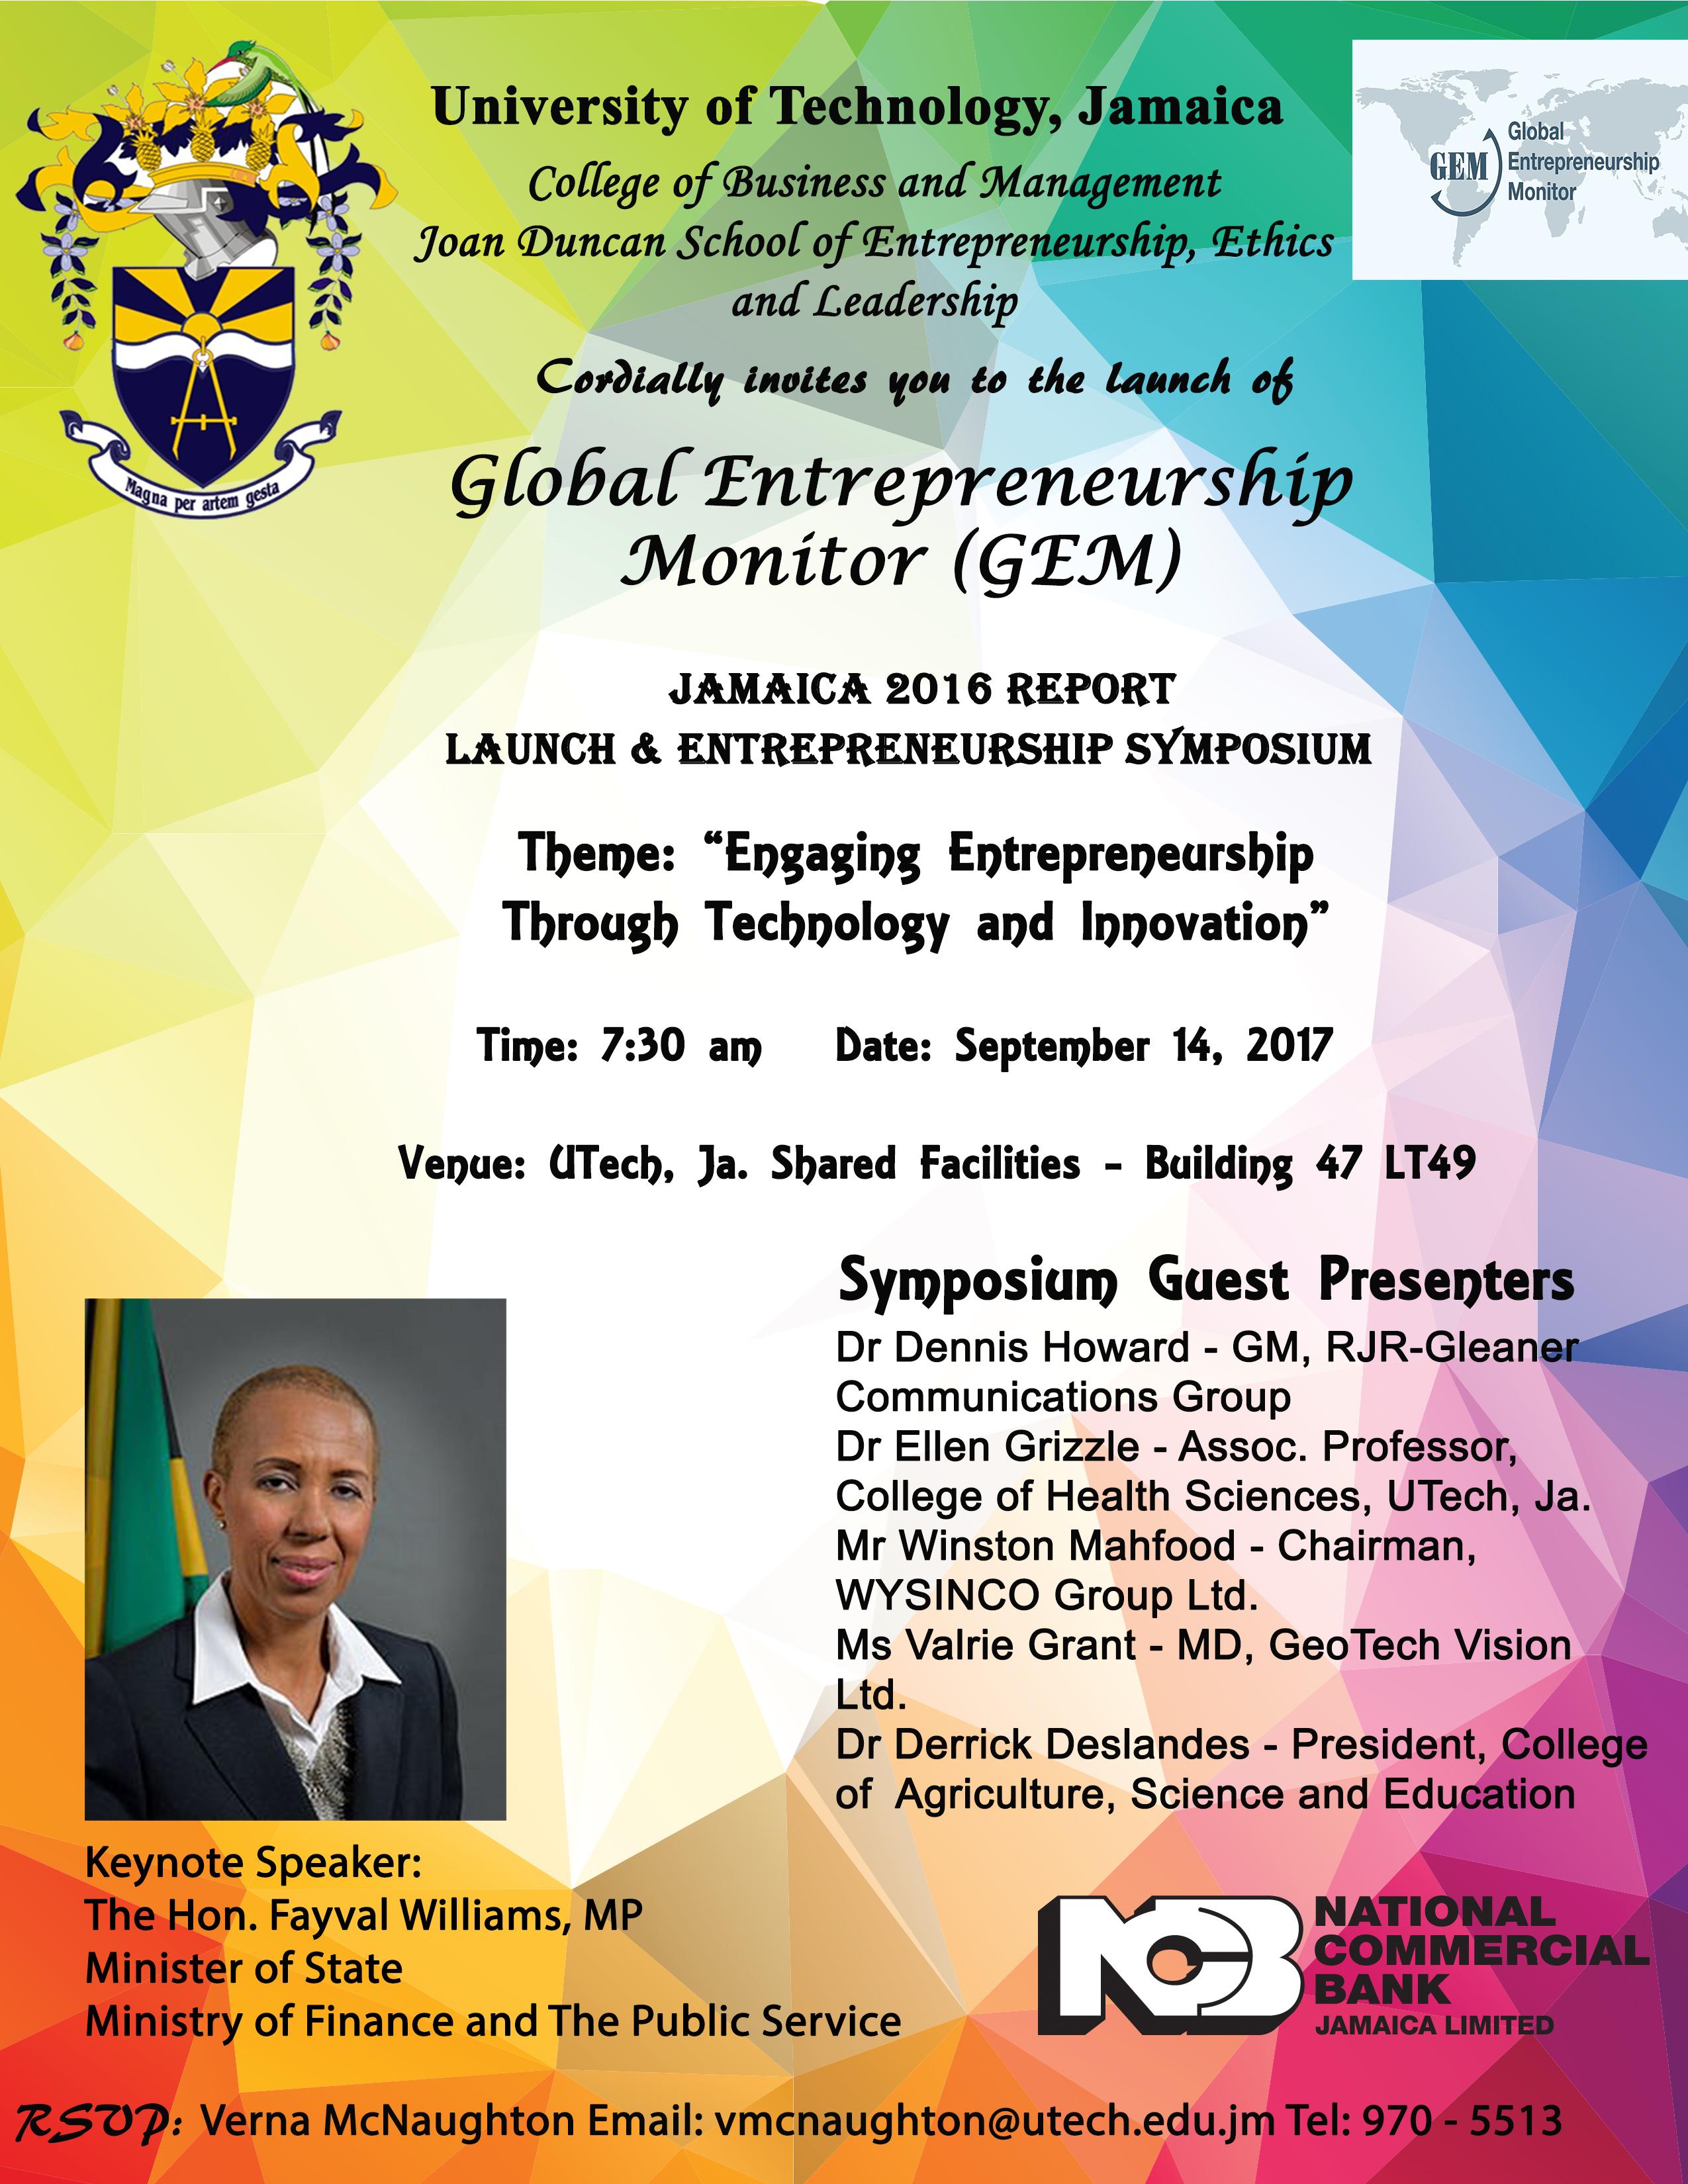 UTech, Jamaica Launches Global Entrepreneurship Monitor (GEM) Jamaica 2016 Report